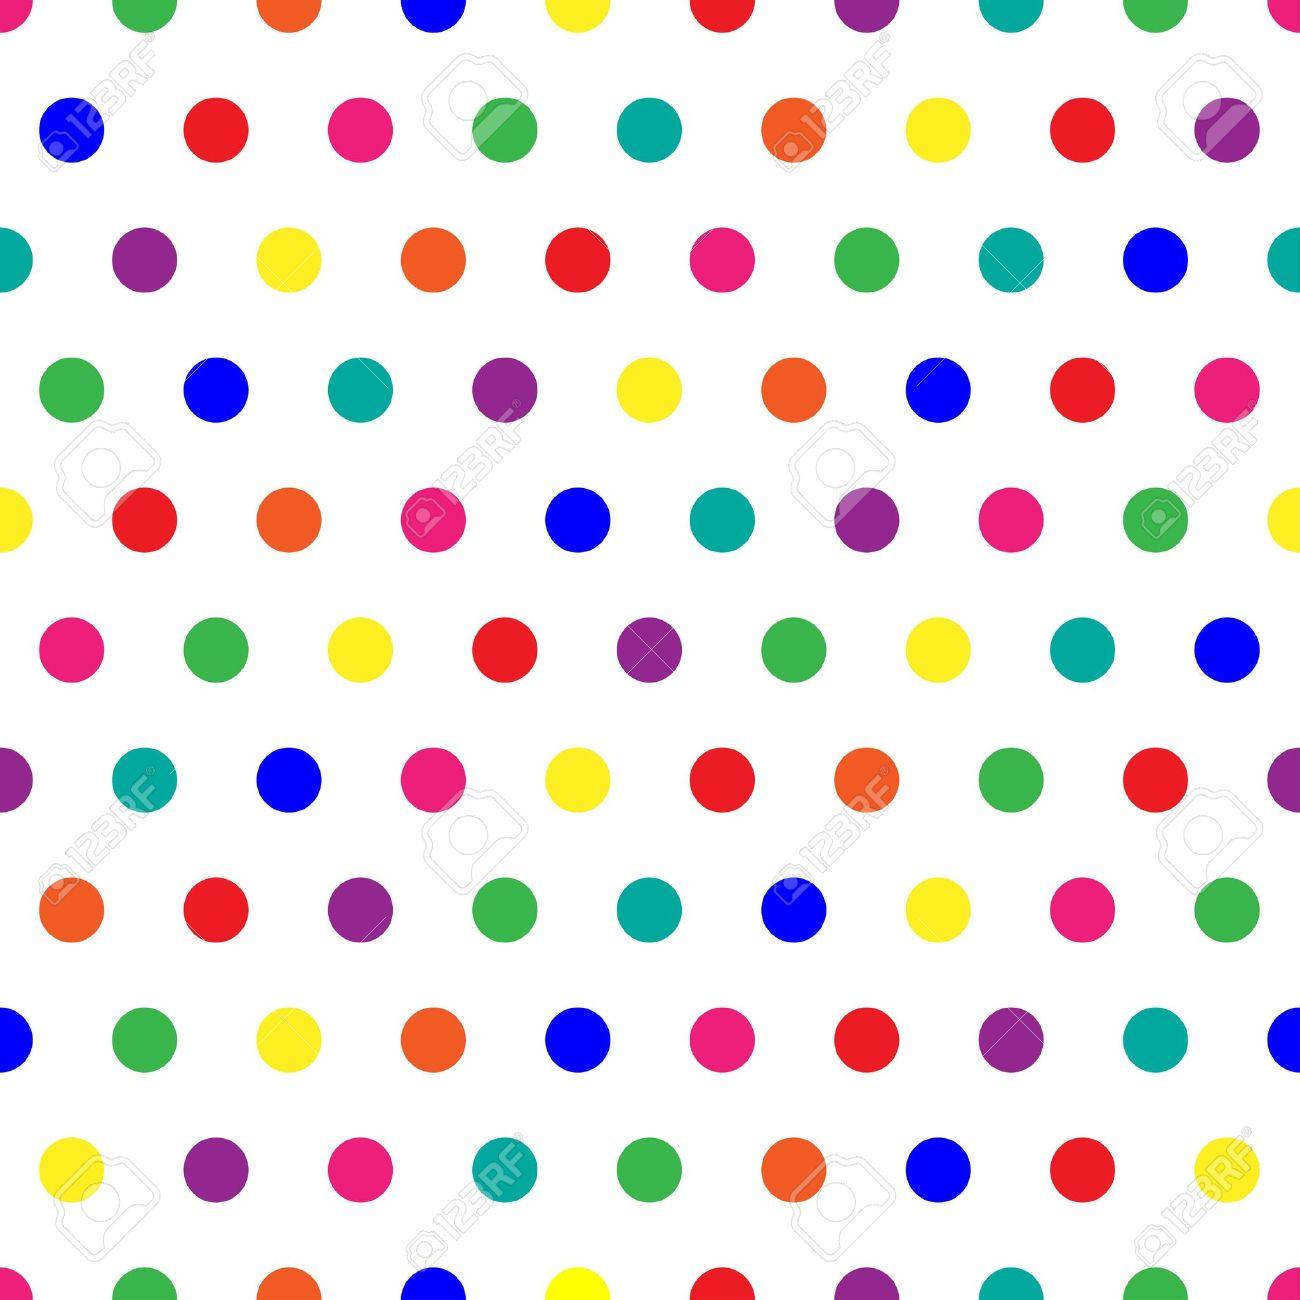 Colorful Polka Dot Background